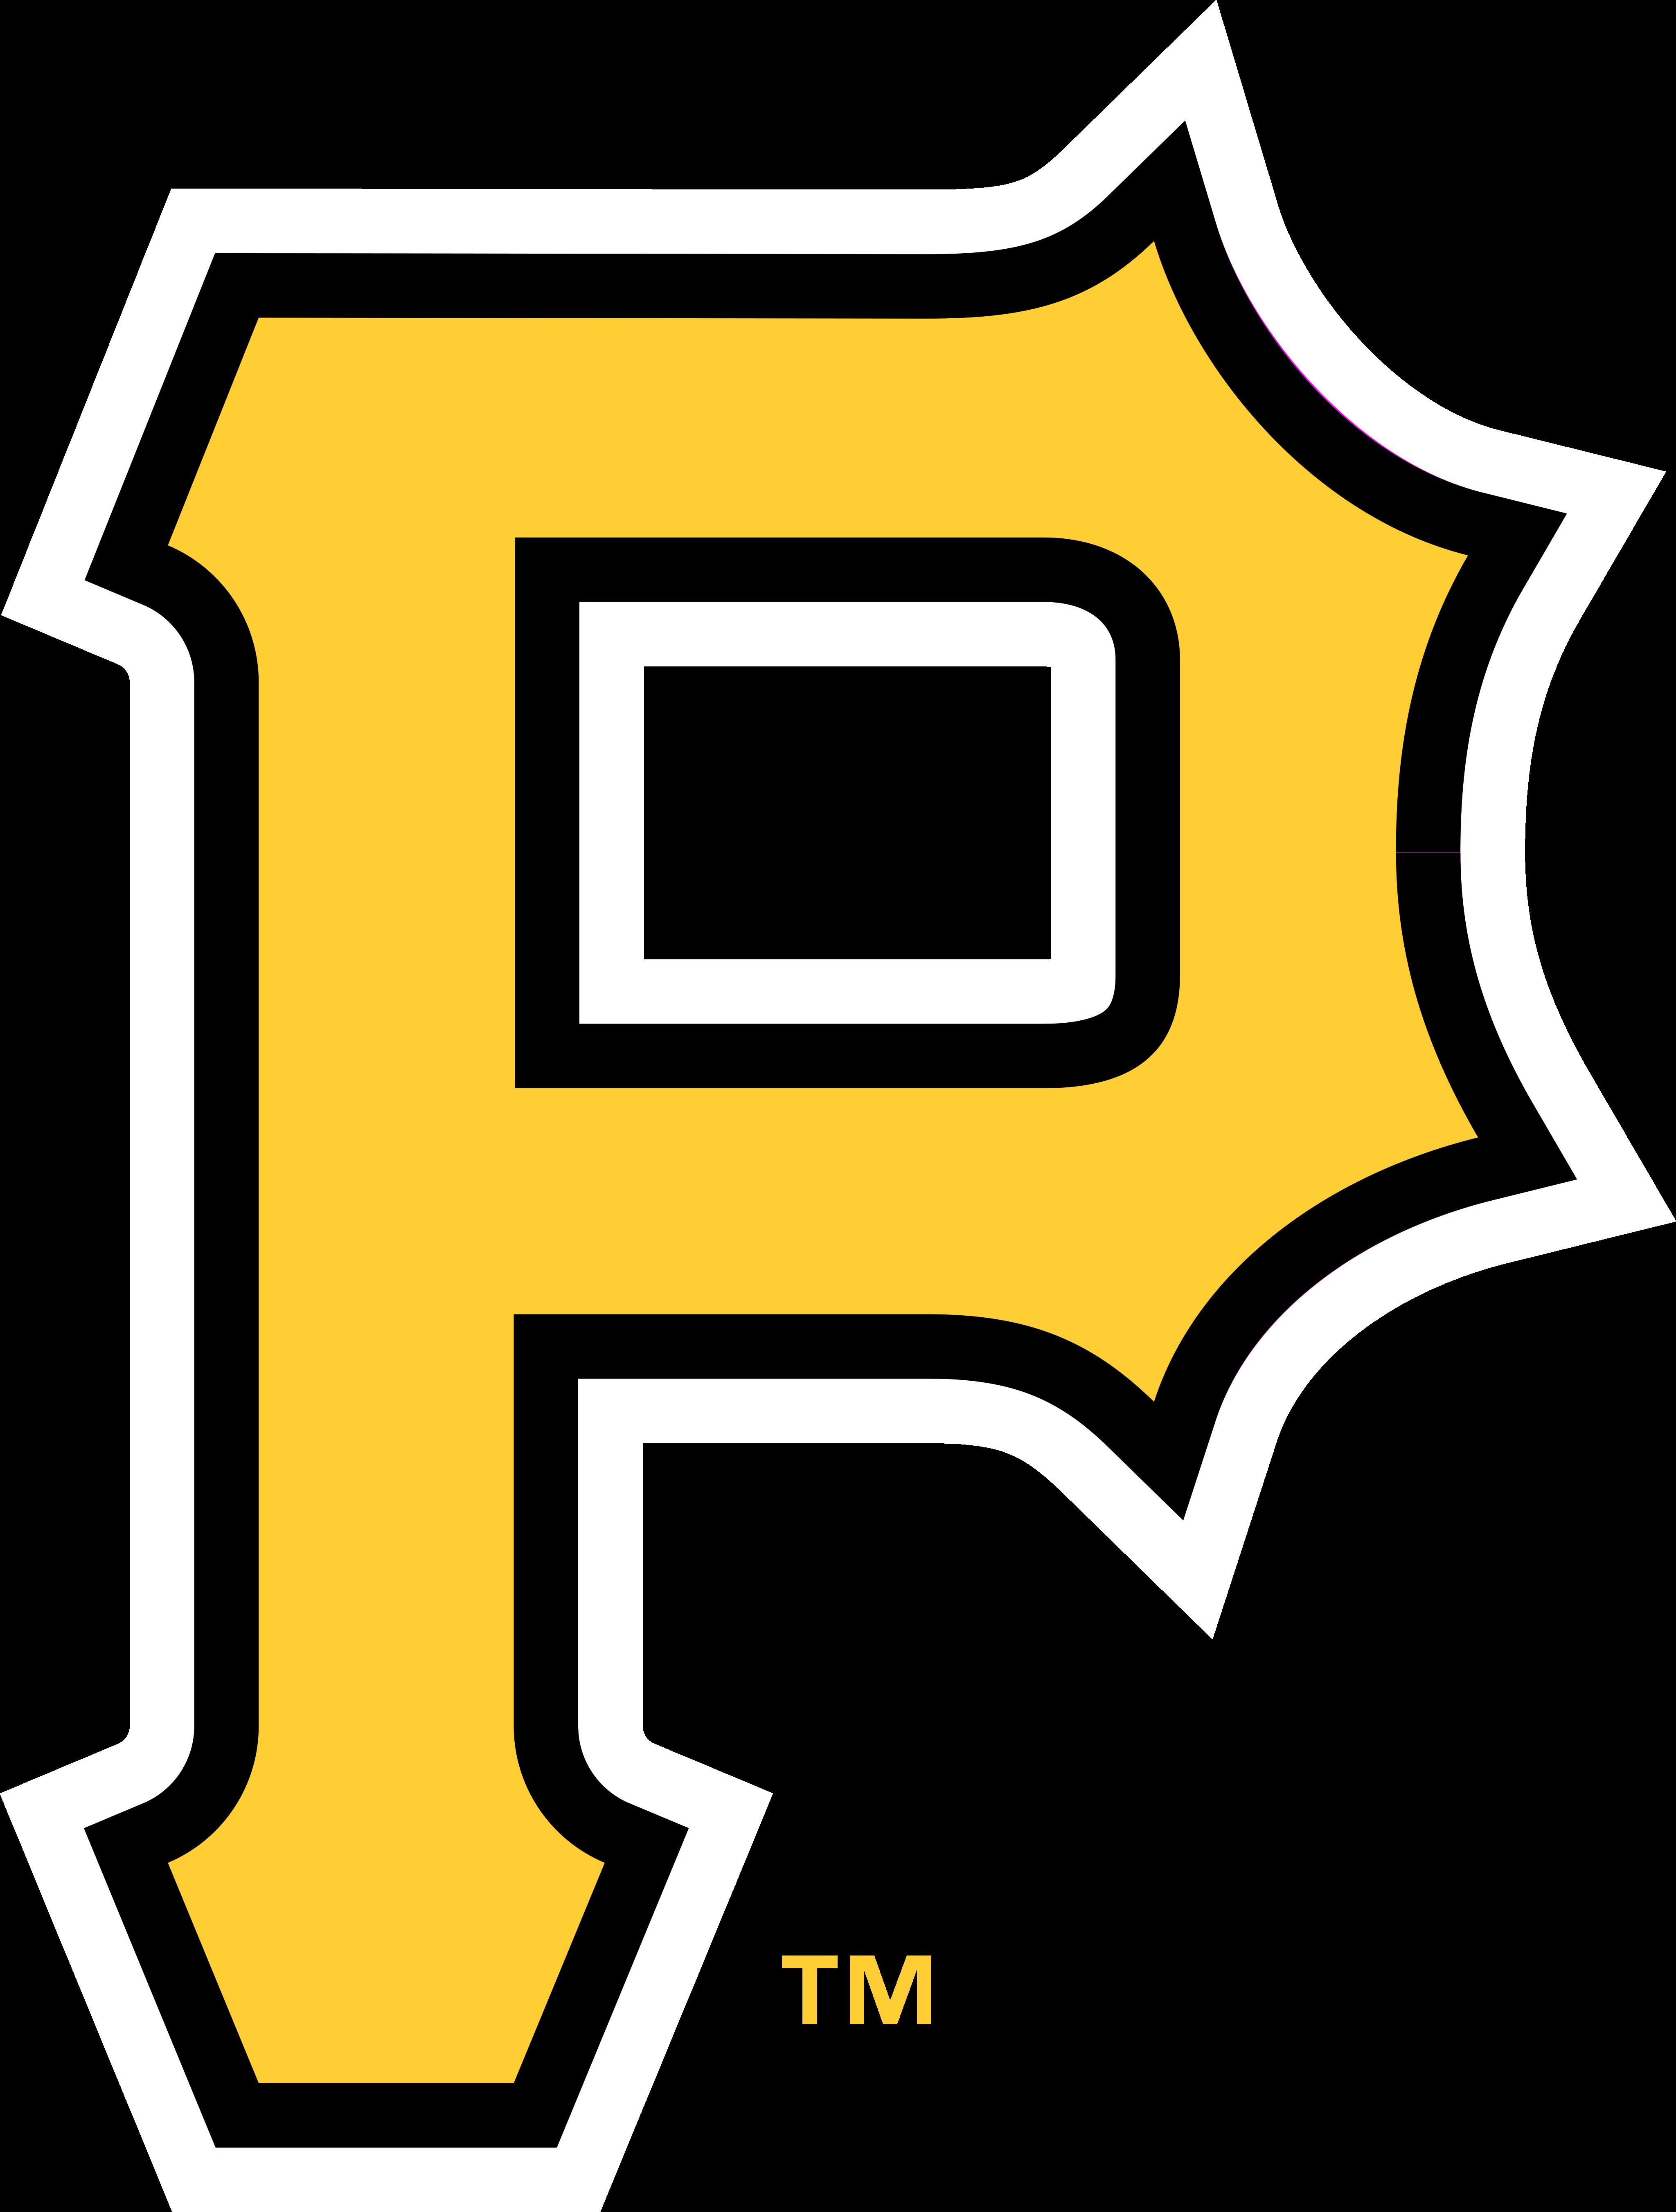 pittsburgh pirates logo - Pittsburgh Pirates Logo